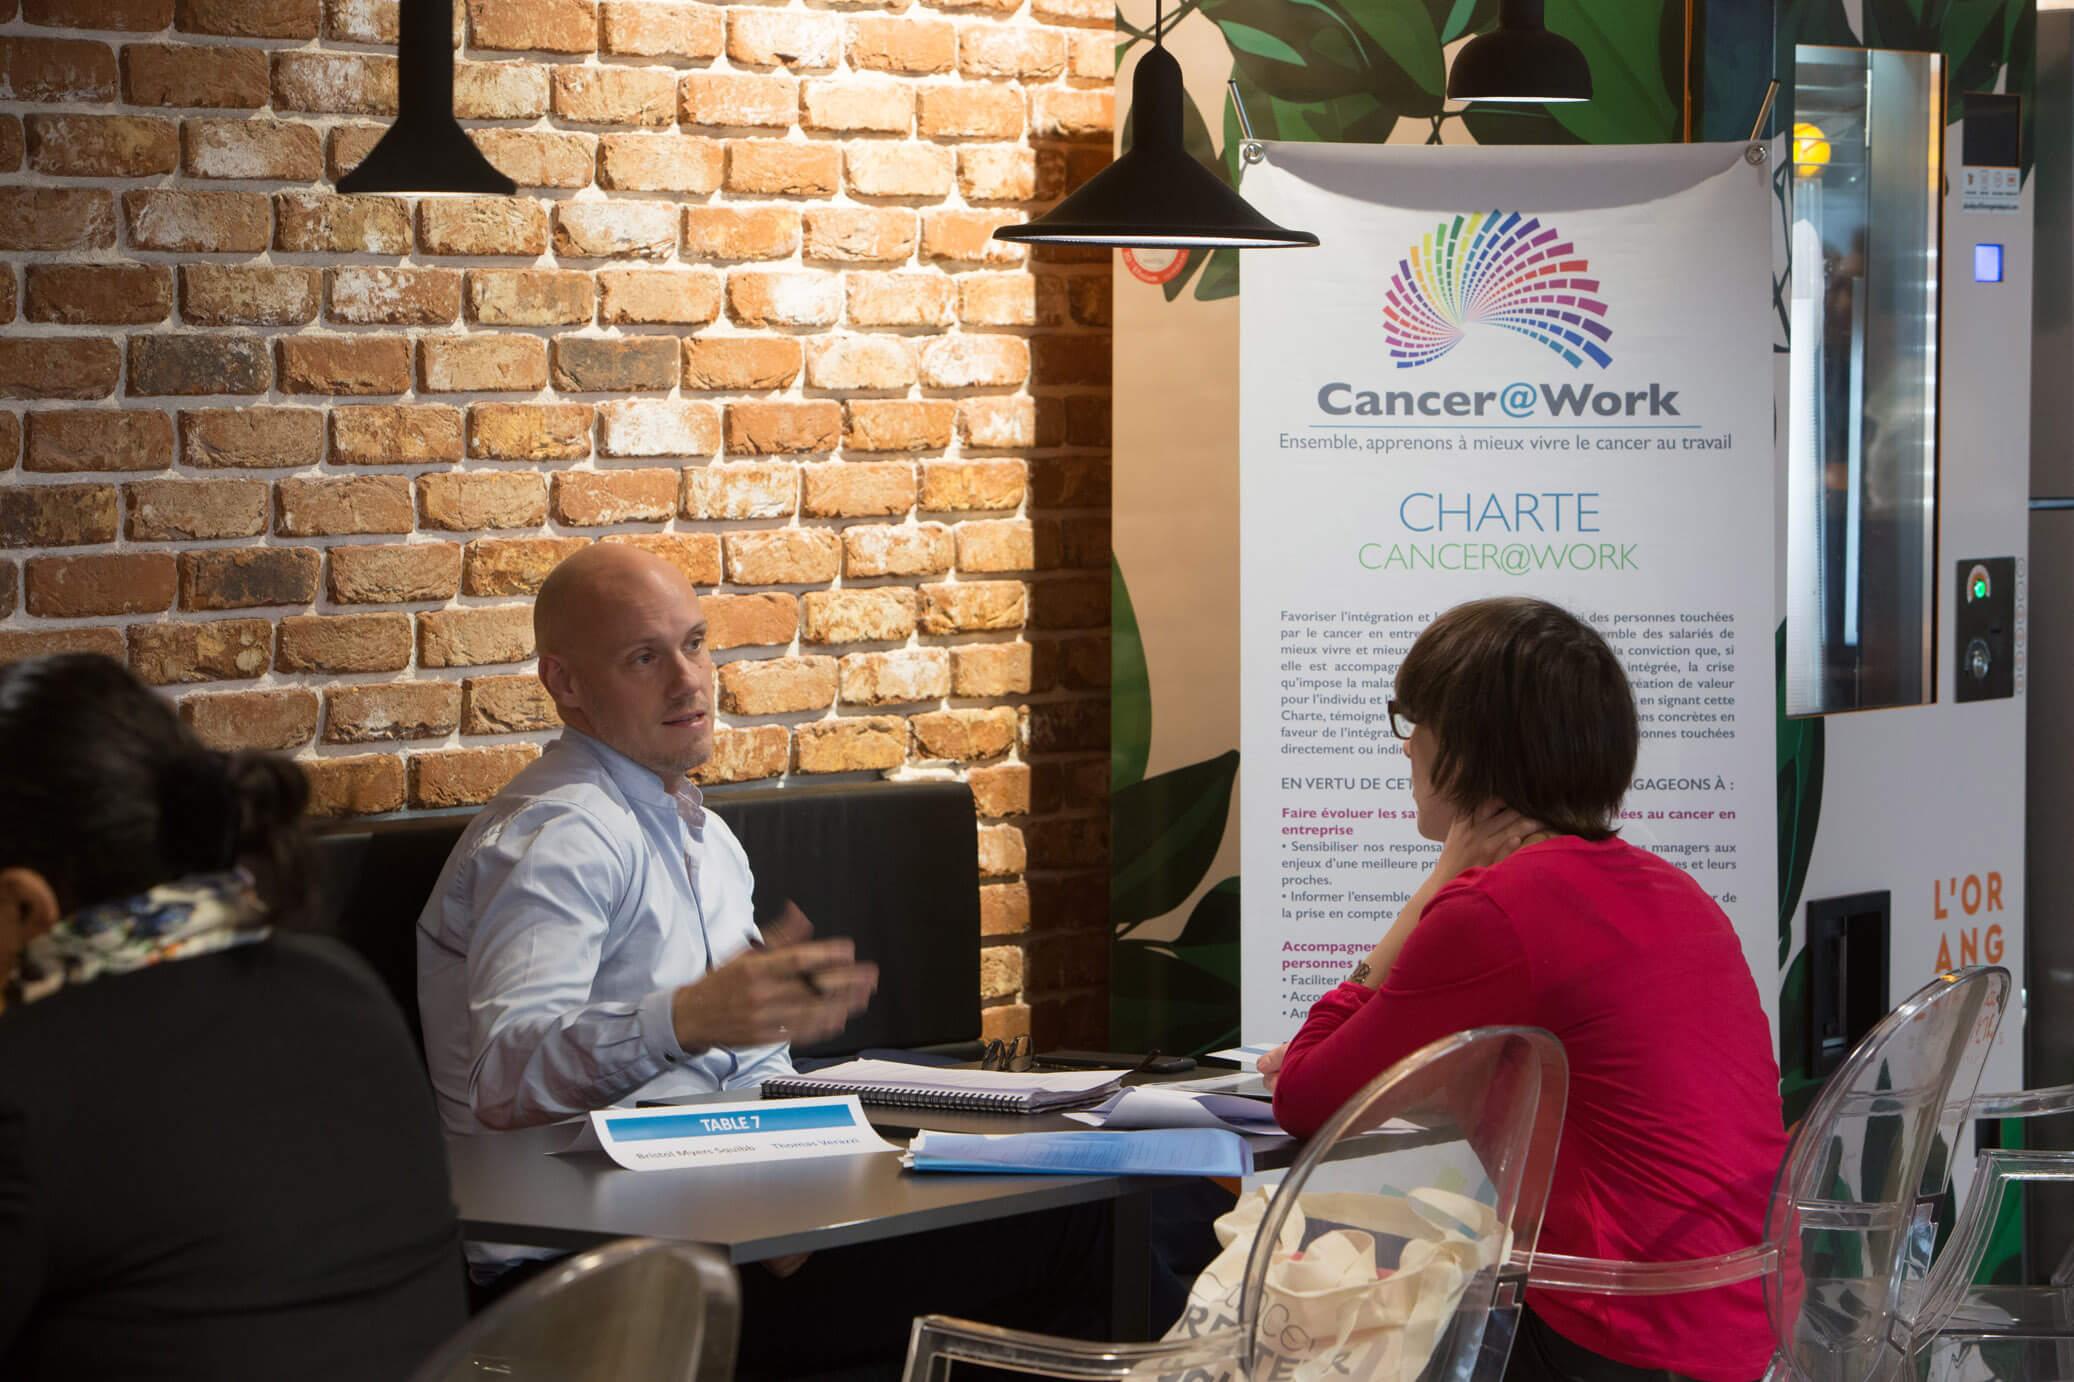 Job dating organisé par Cancer@Work